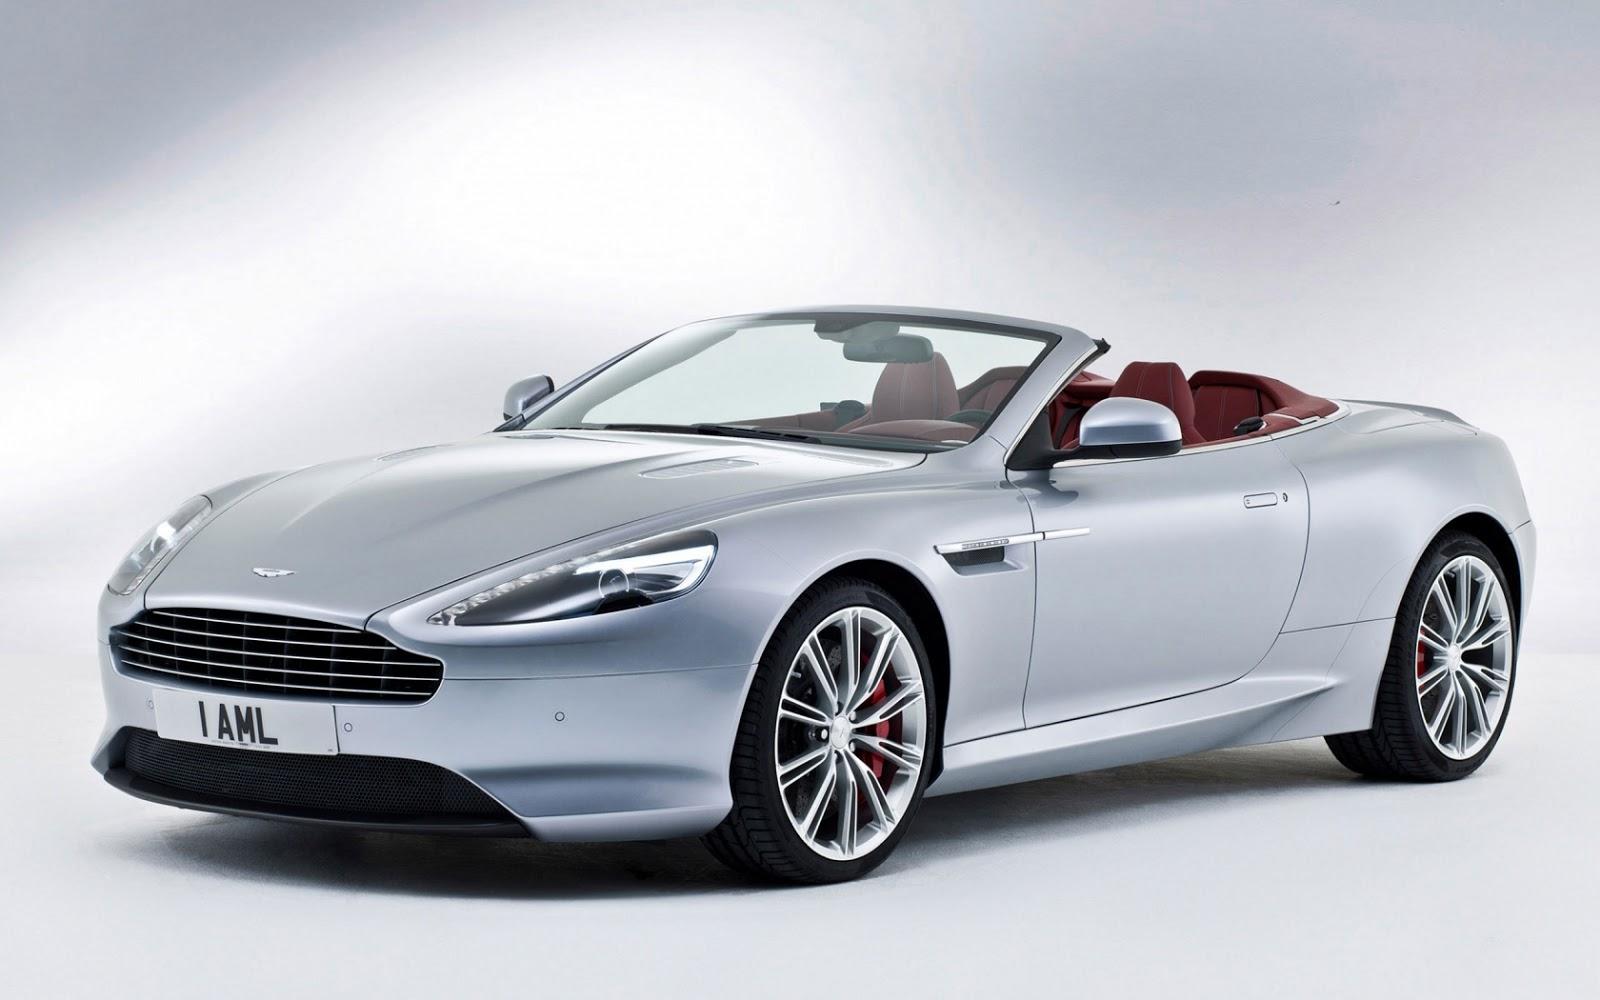 http://3.bp.blogspot.com/-wkIZbIkwkKU/UXJX6T5L19I/AAAAAAAAAUk/jfYOvTJ1zk4/s1600/2013+Aston+Martin+DB9+Coupe.jpg